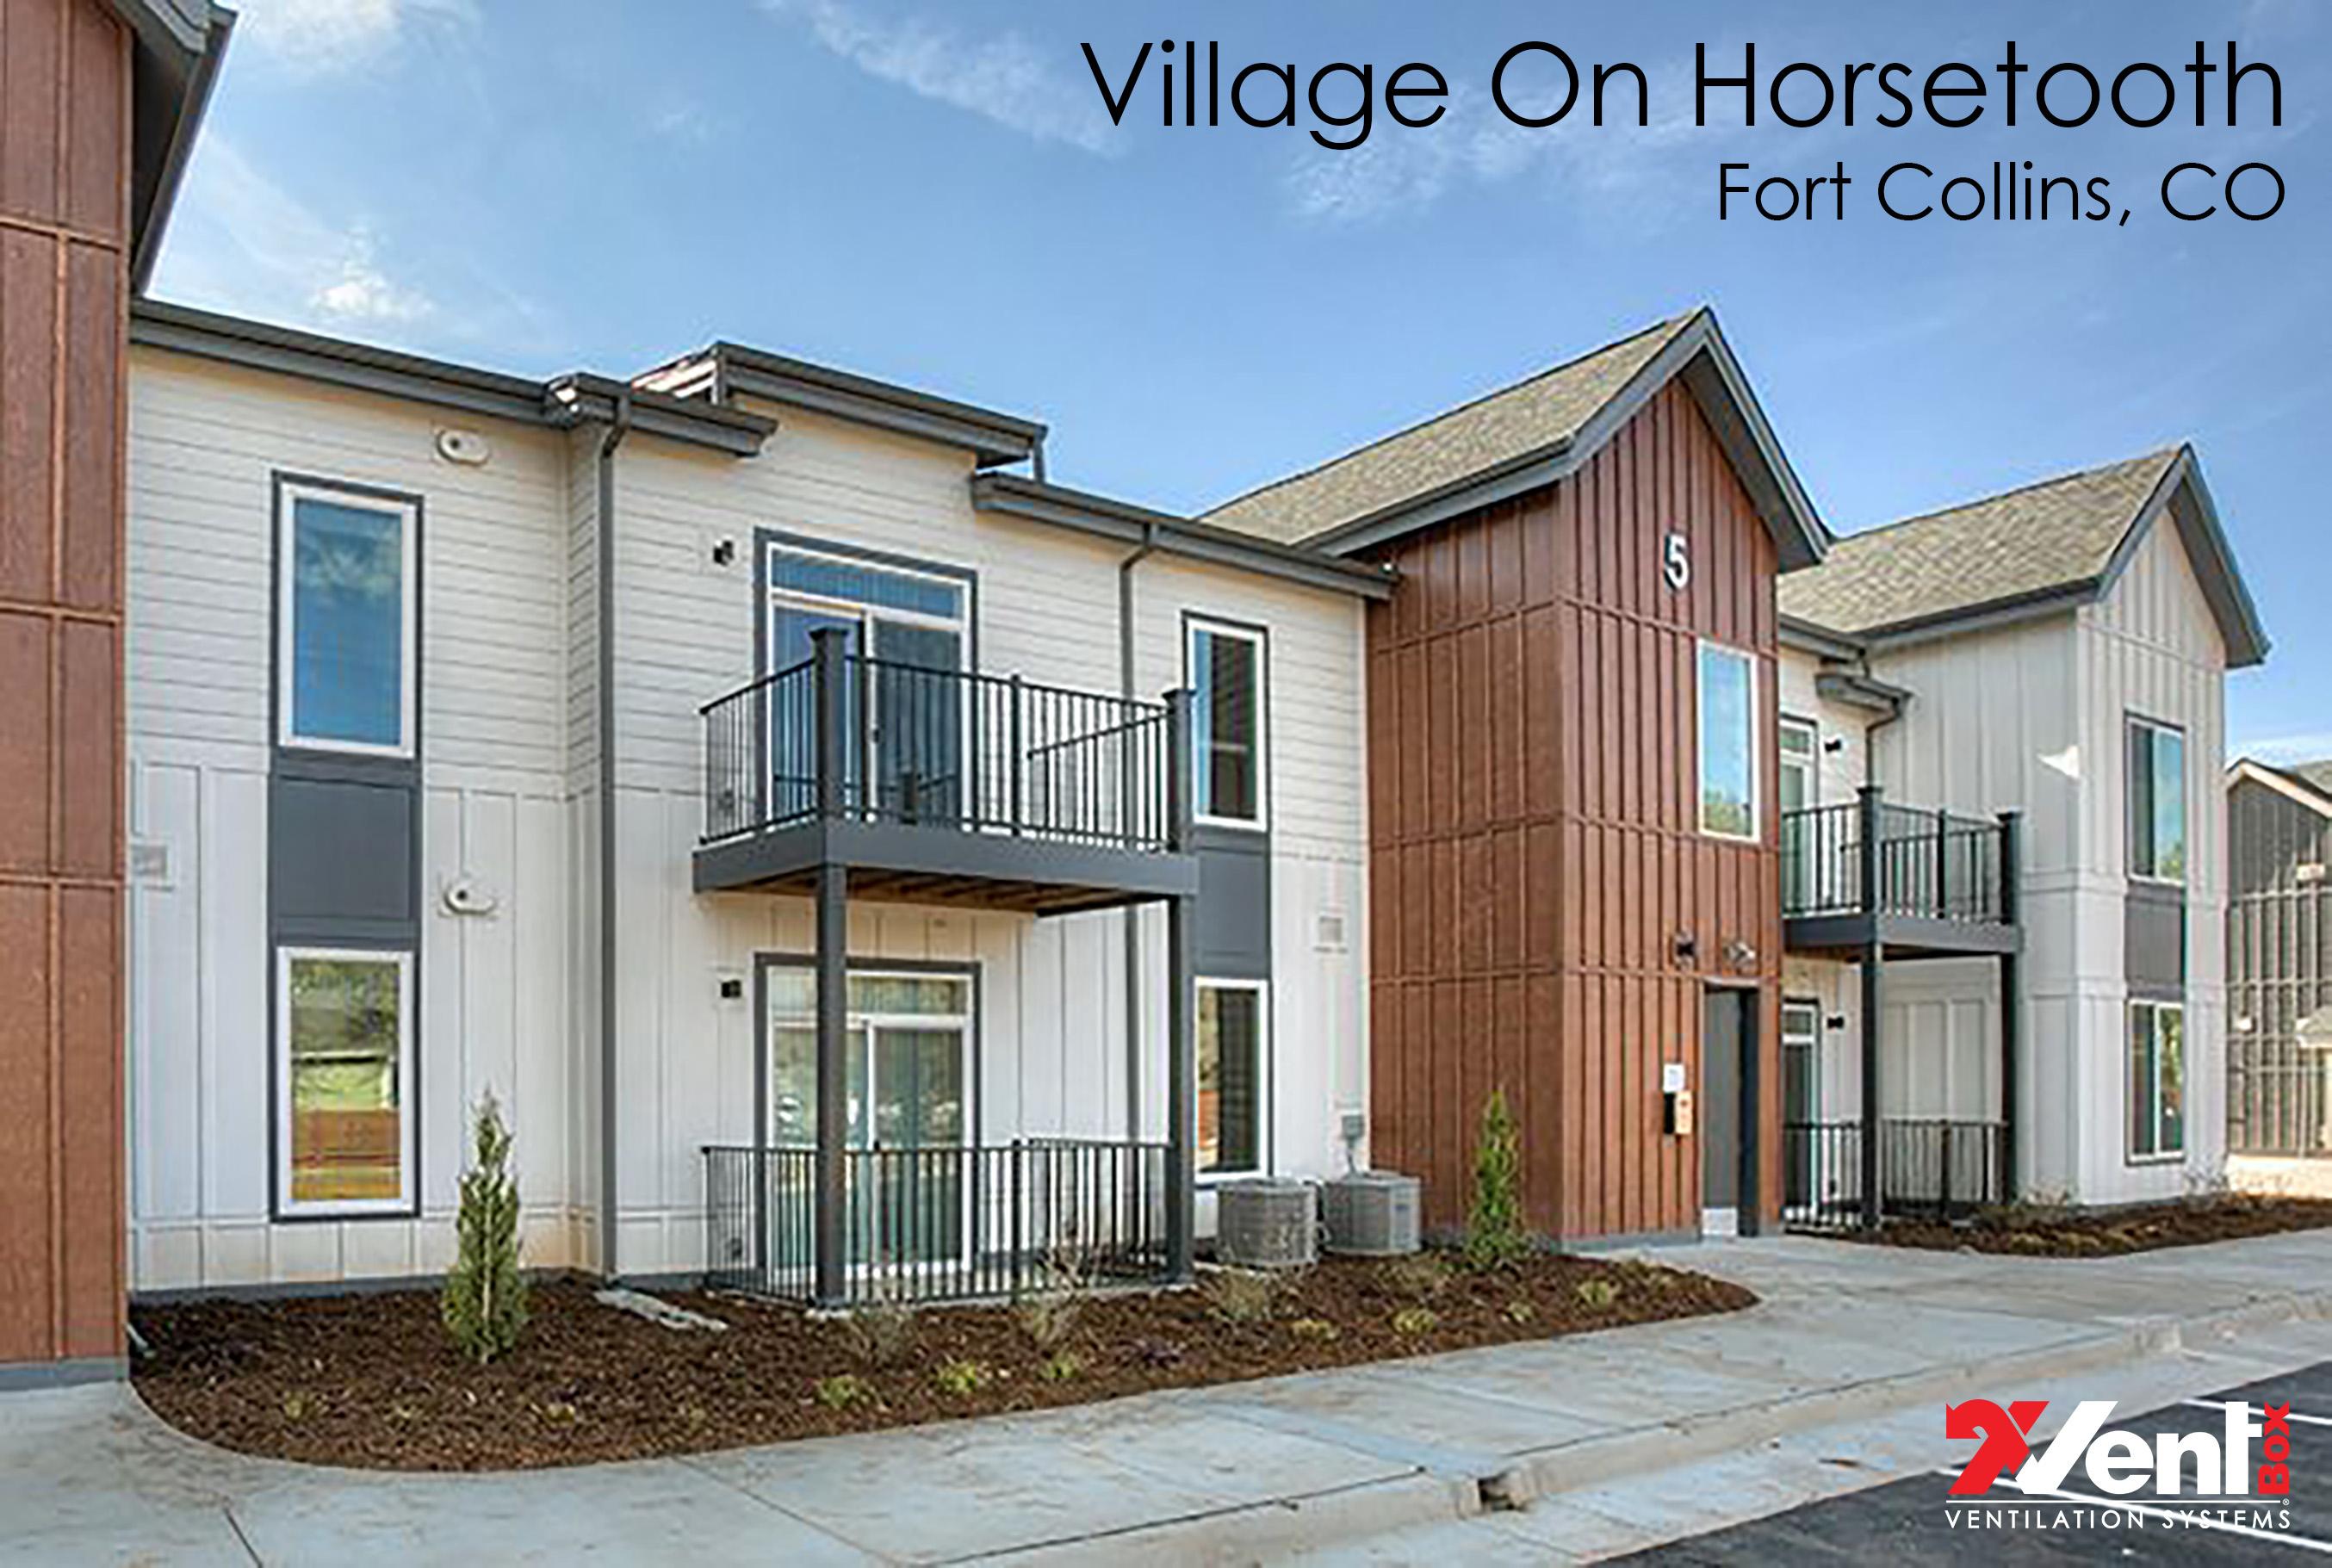 Village on Horsetooth